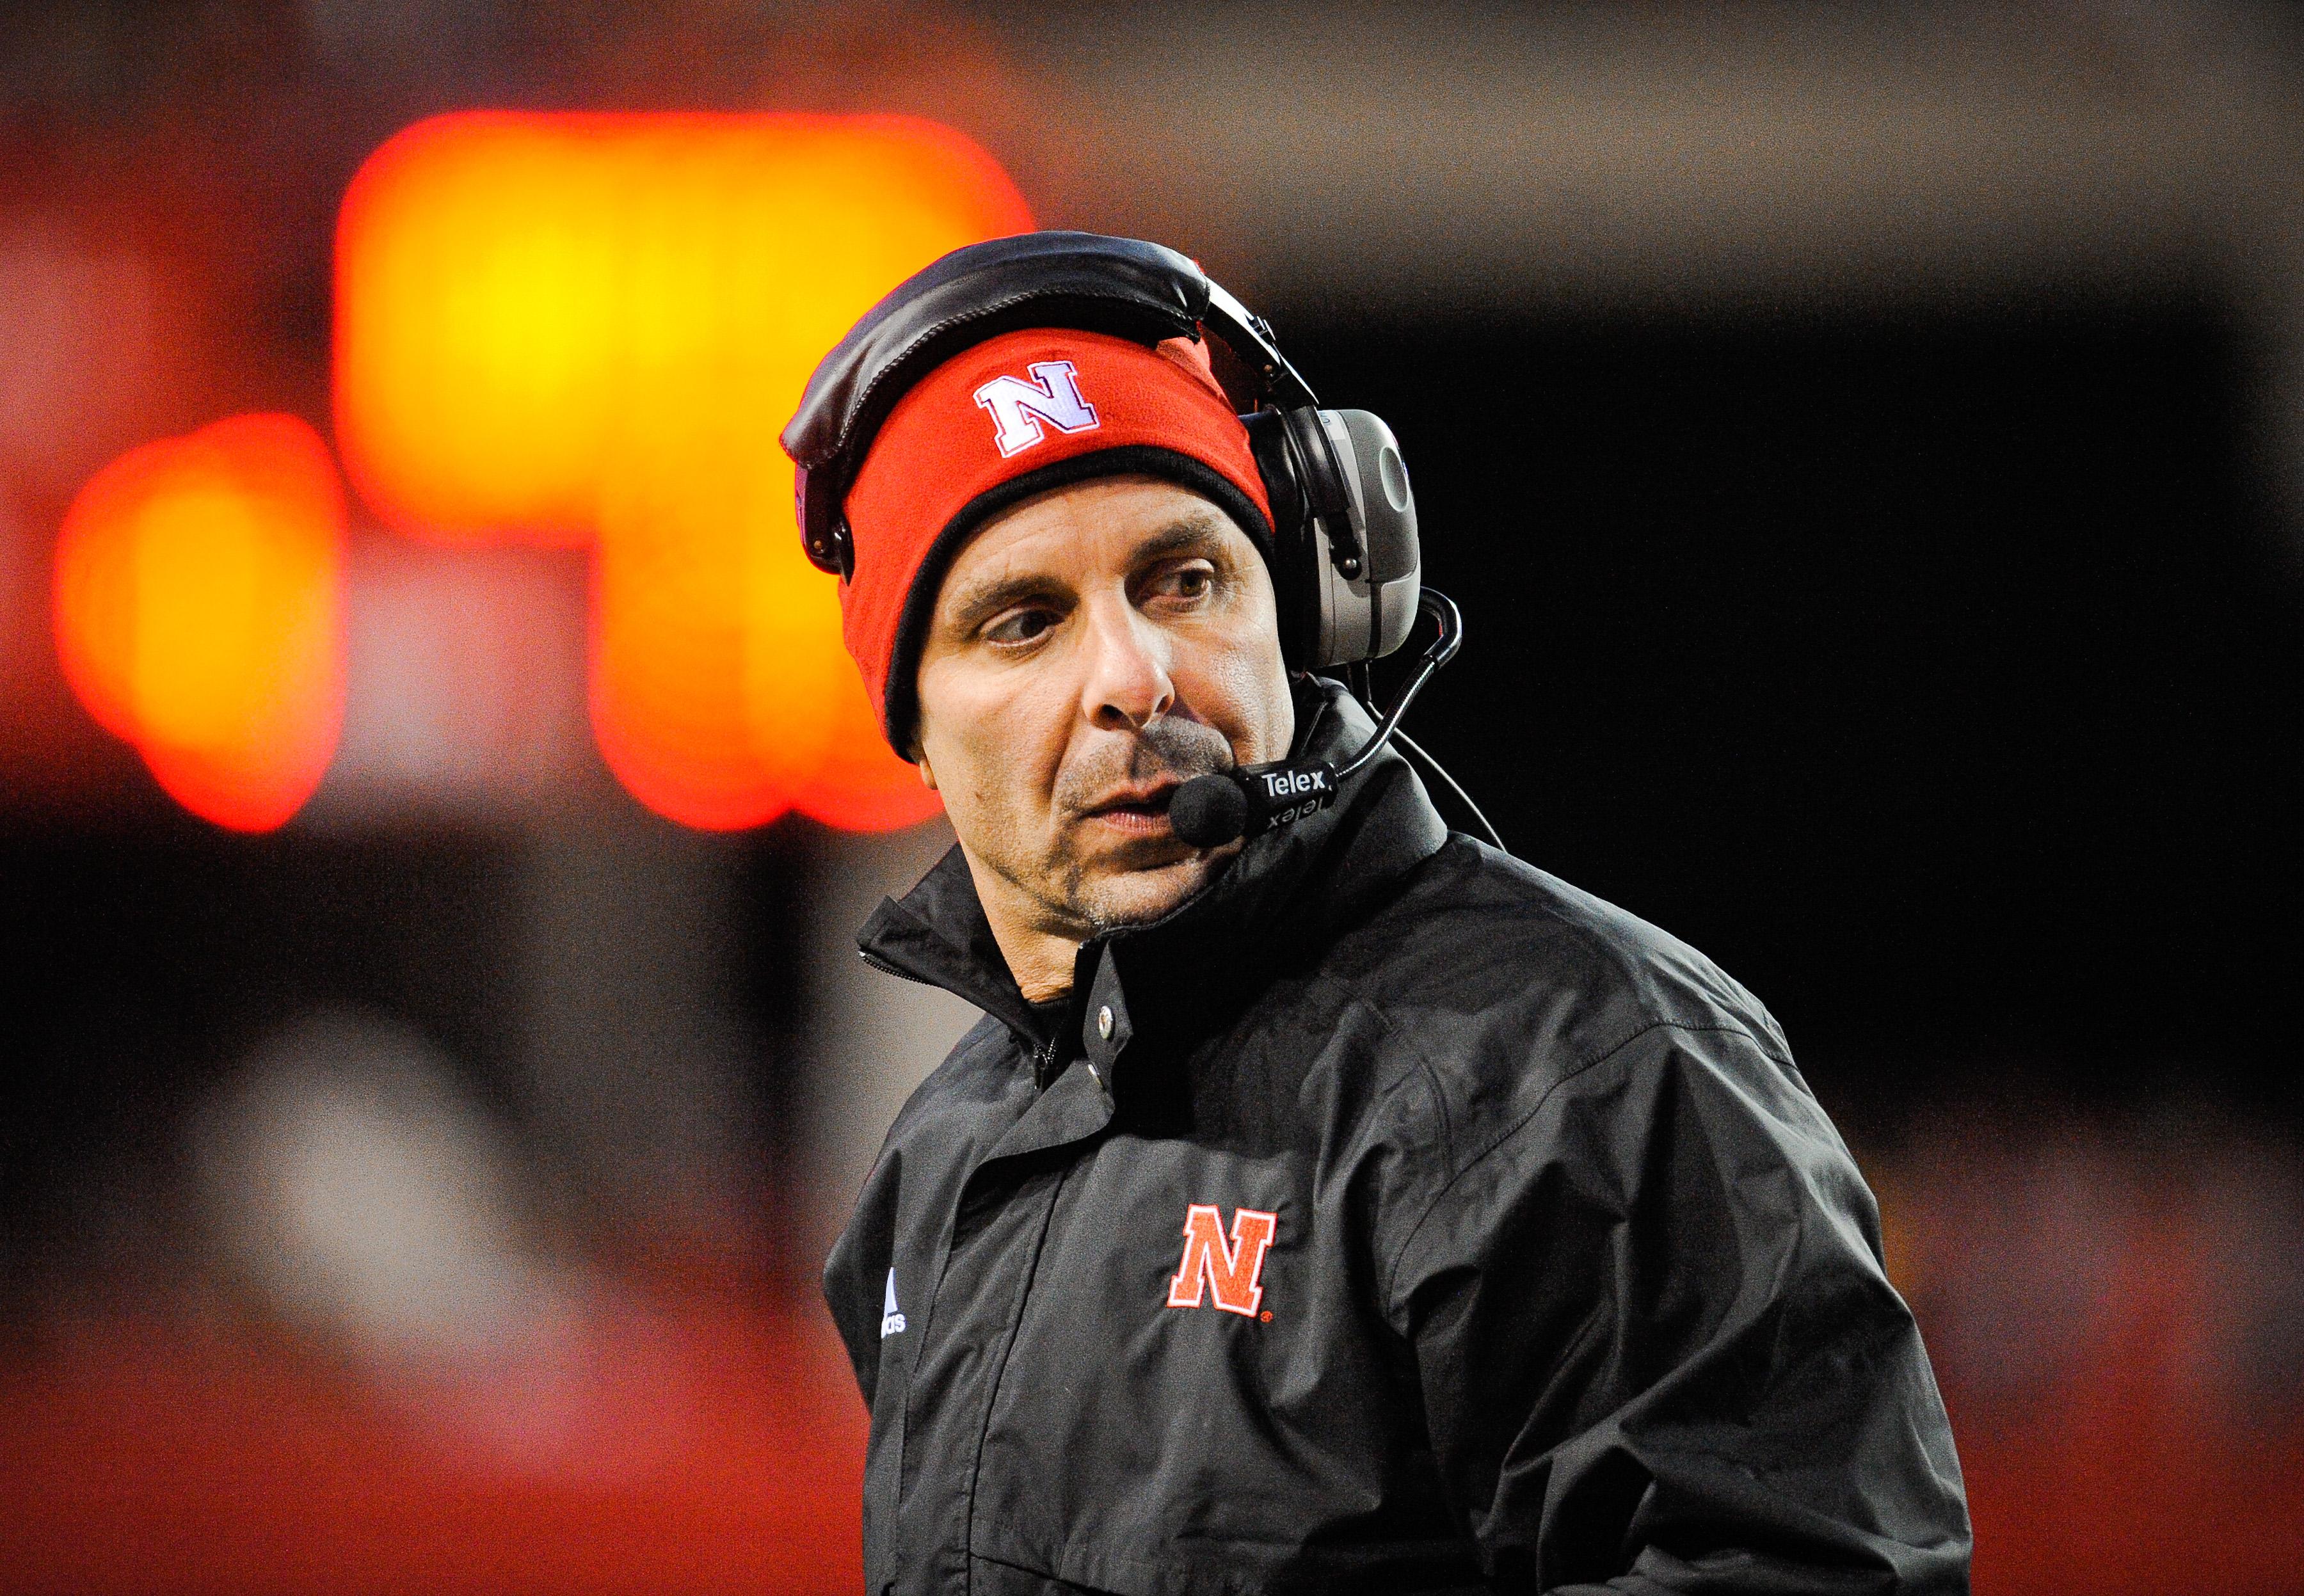 Ex-Nebraska coaches are slowly taking over Ohio's college football teams